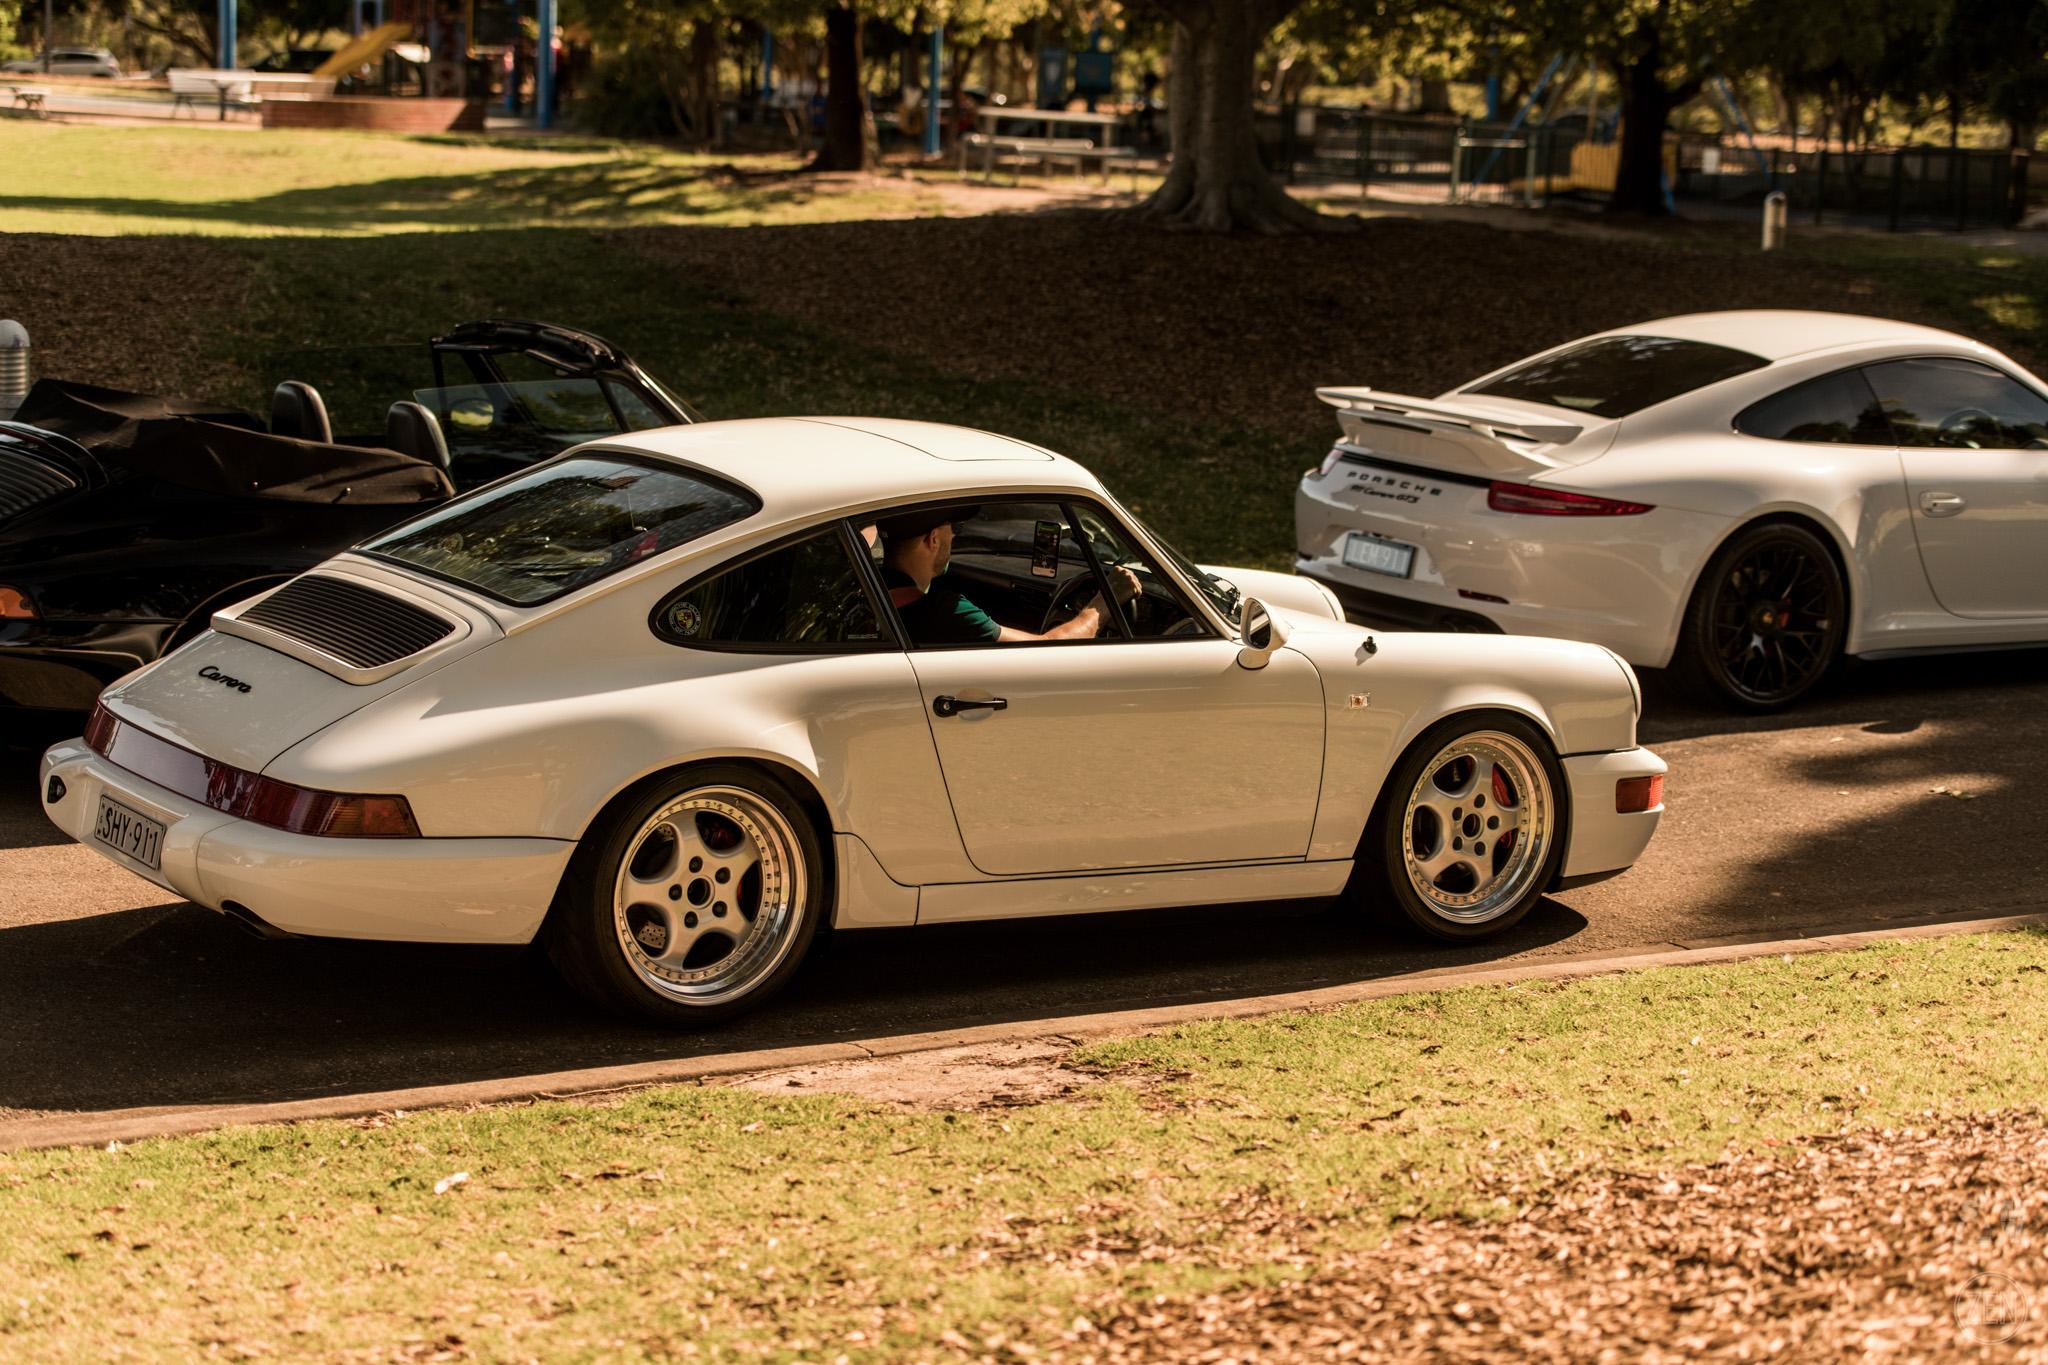 2019-10-27 - Autohaus Porsches & Coffee 148